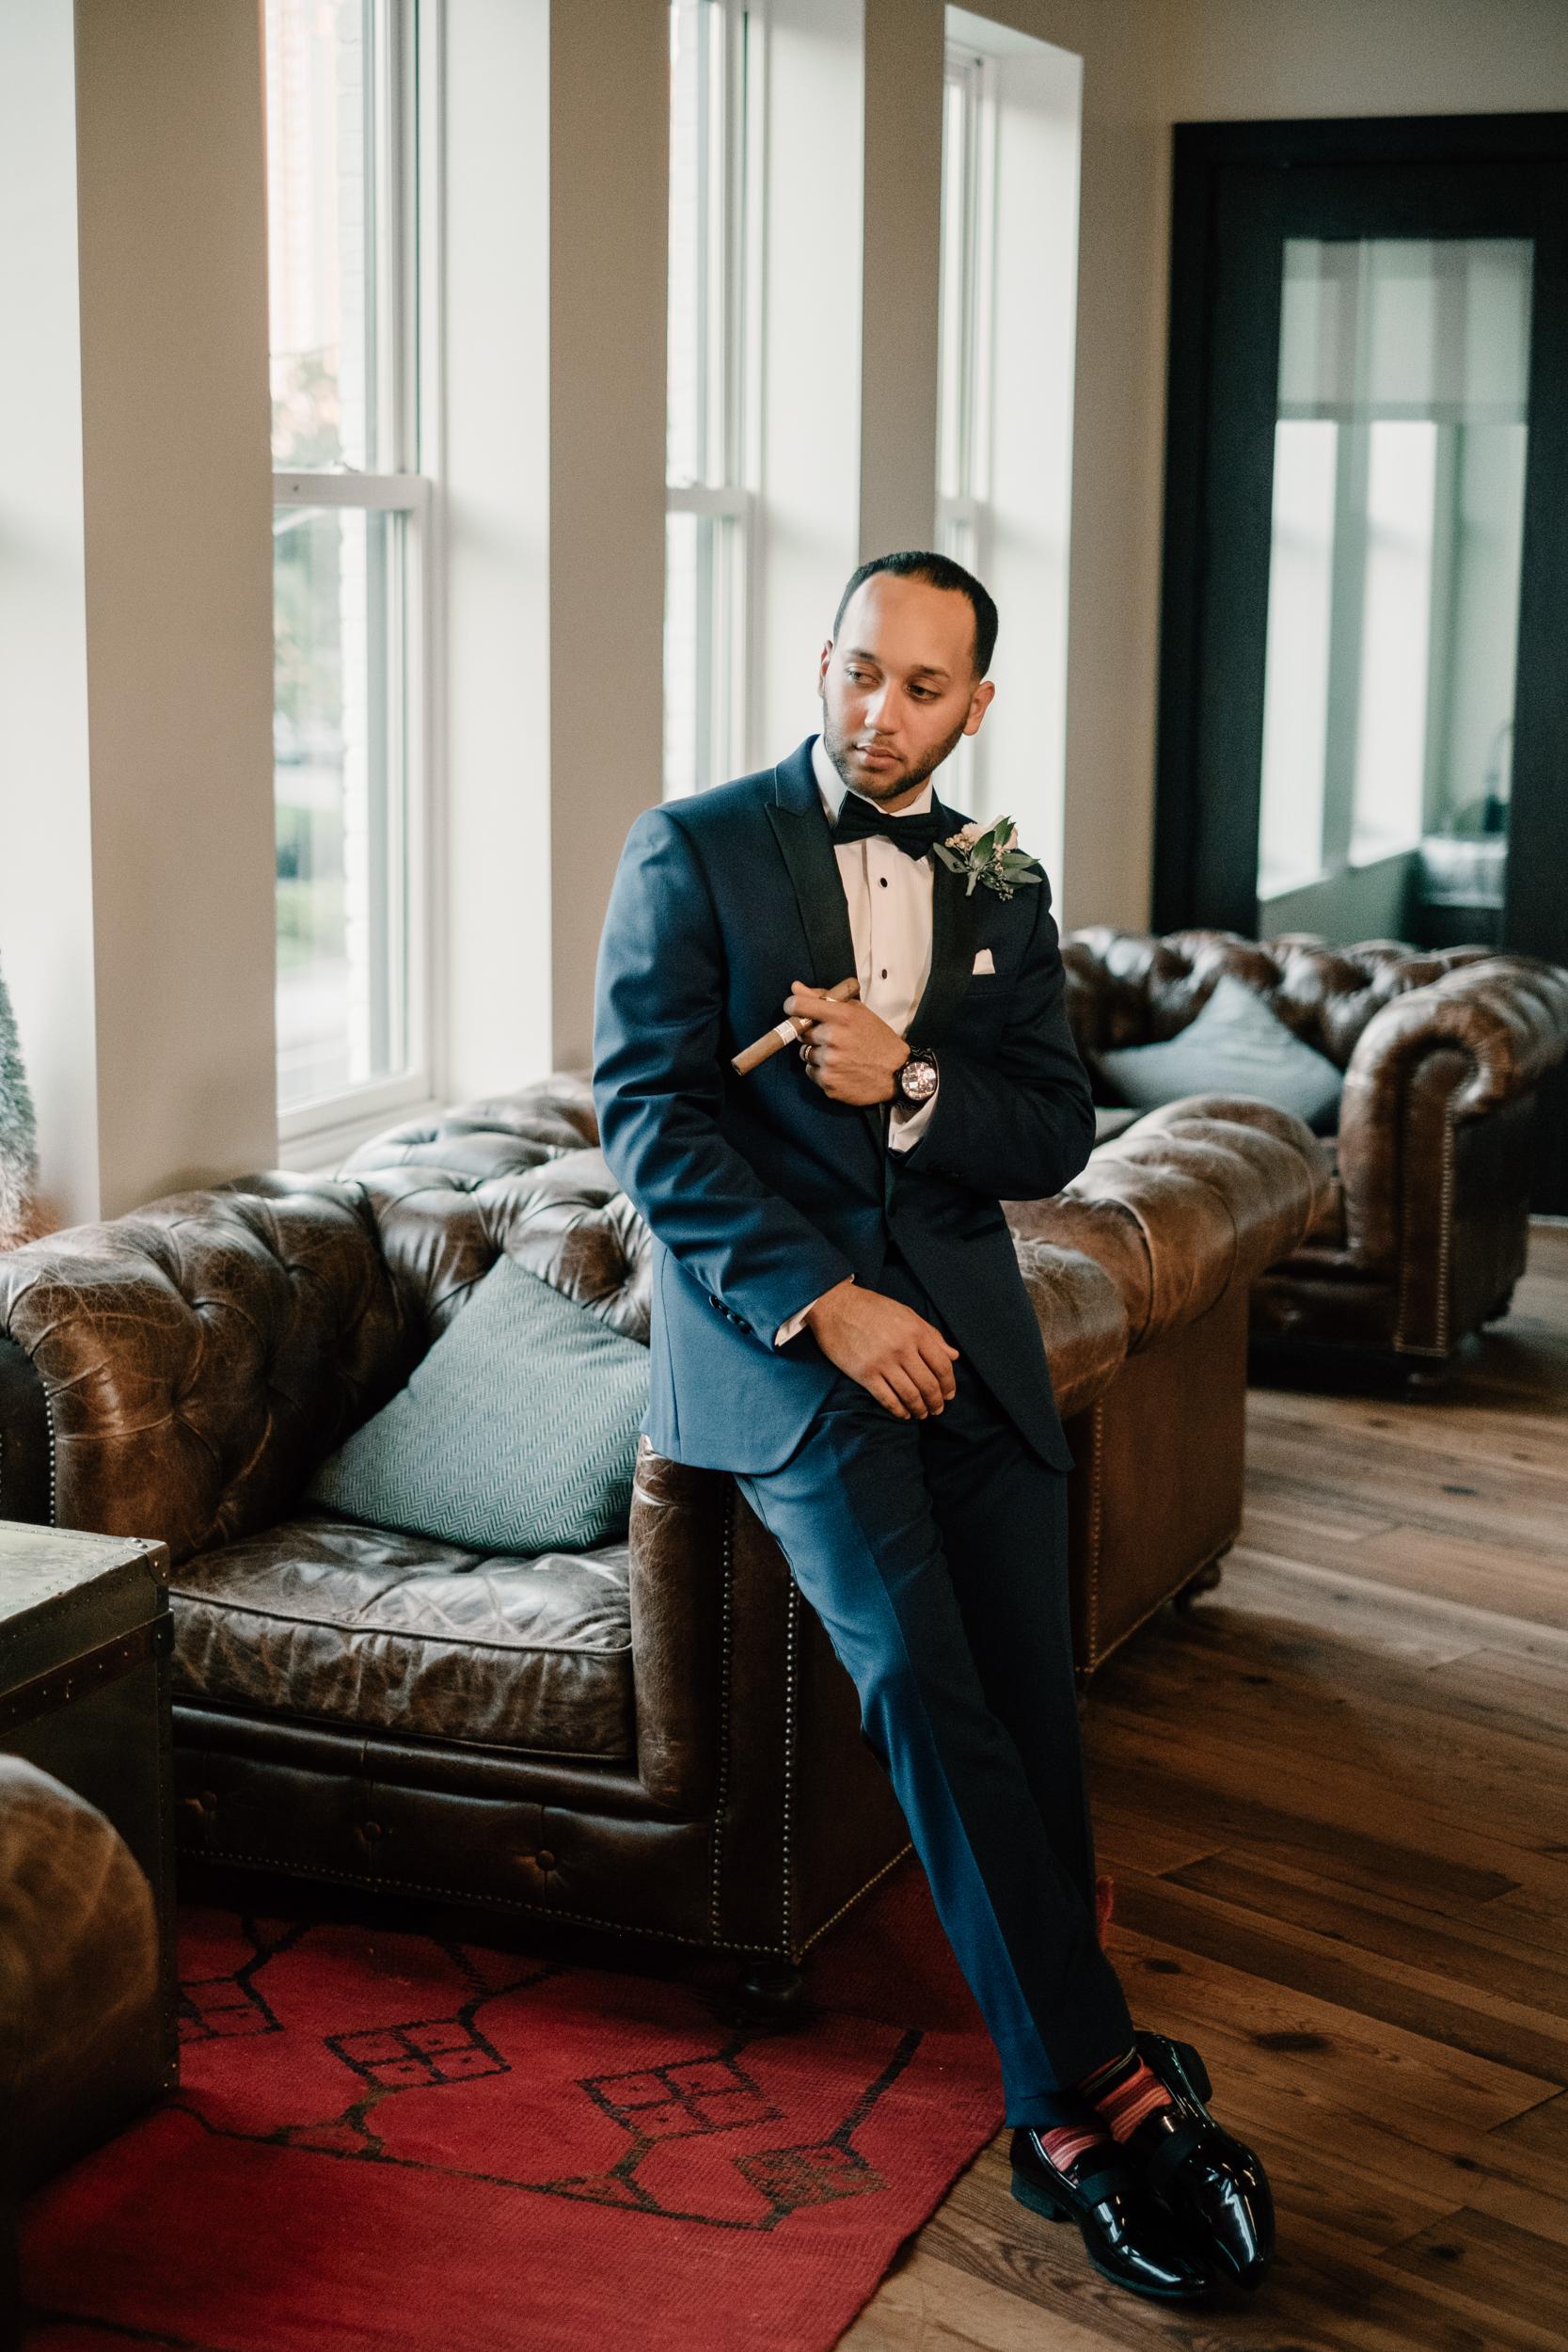 Amethyst Weddings - Erwin & Alondra Preview 010  web.jpg